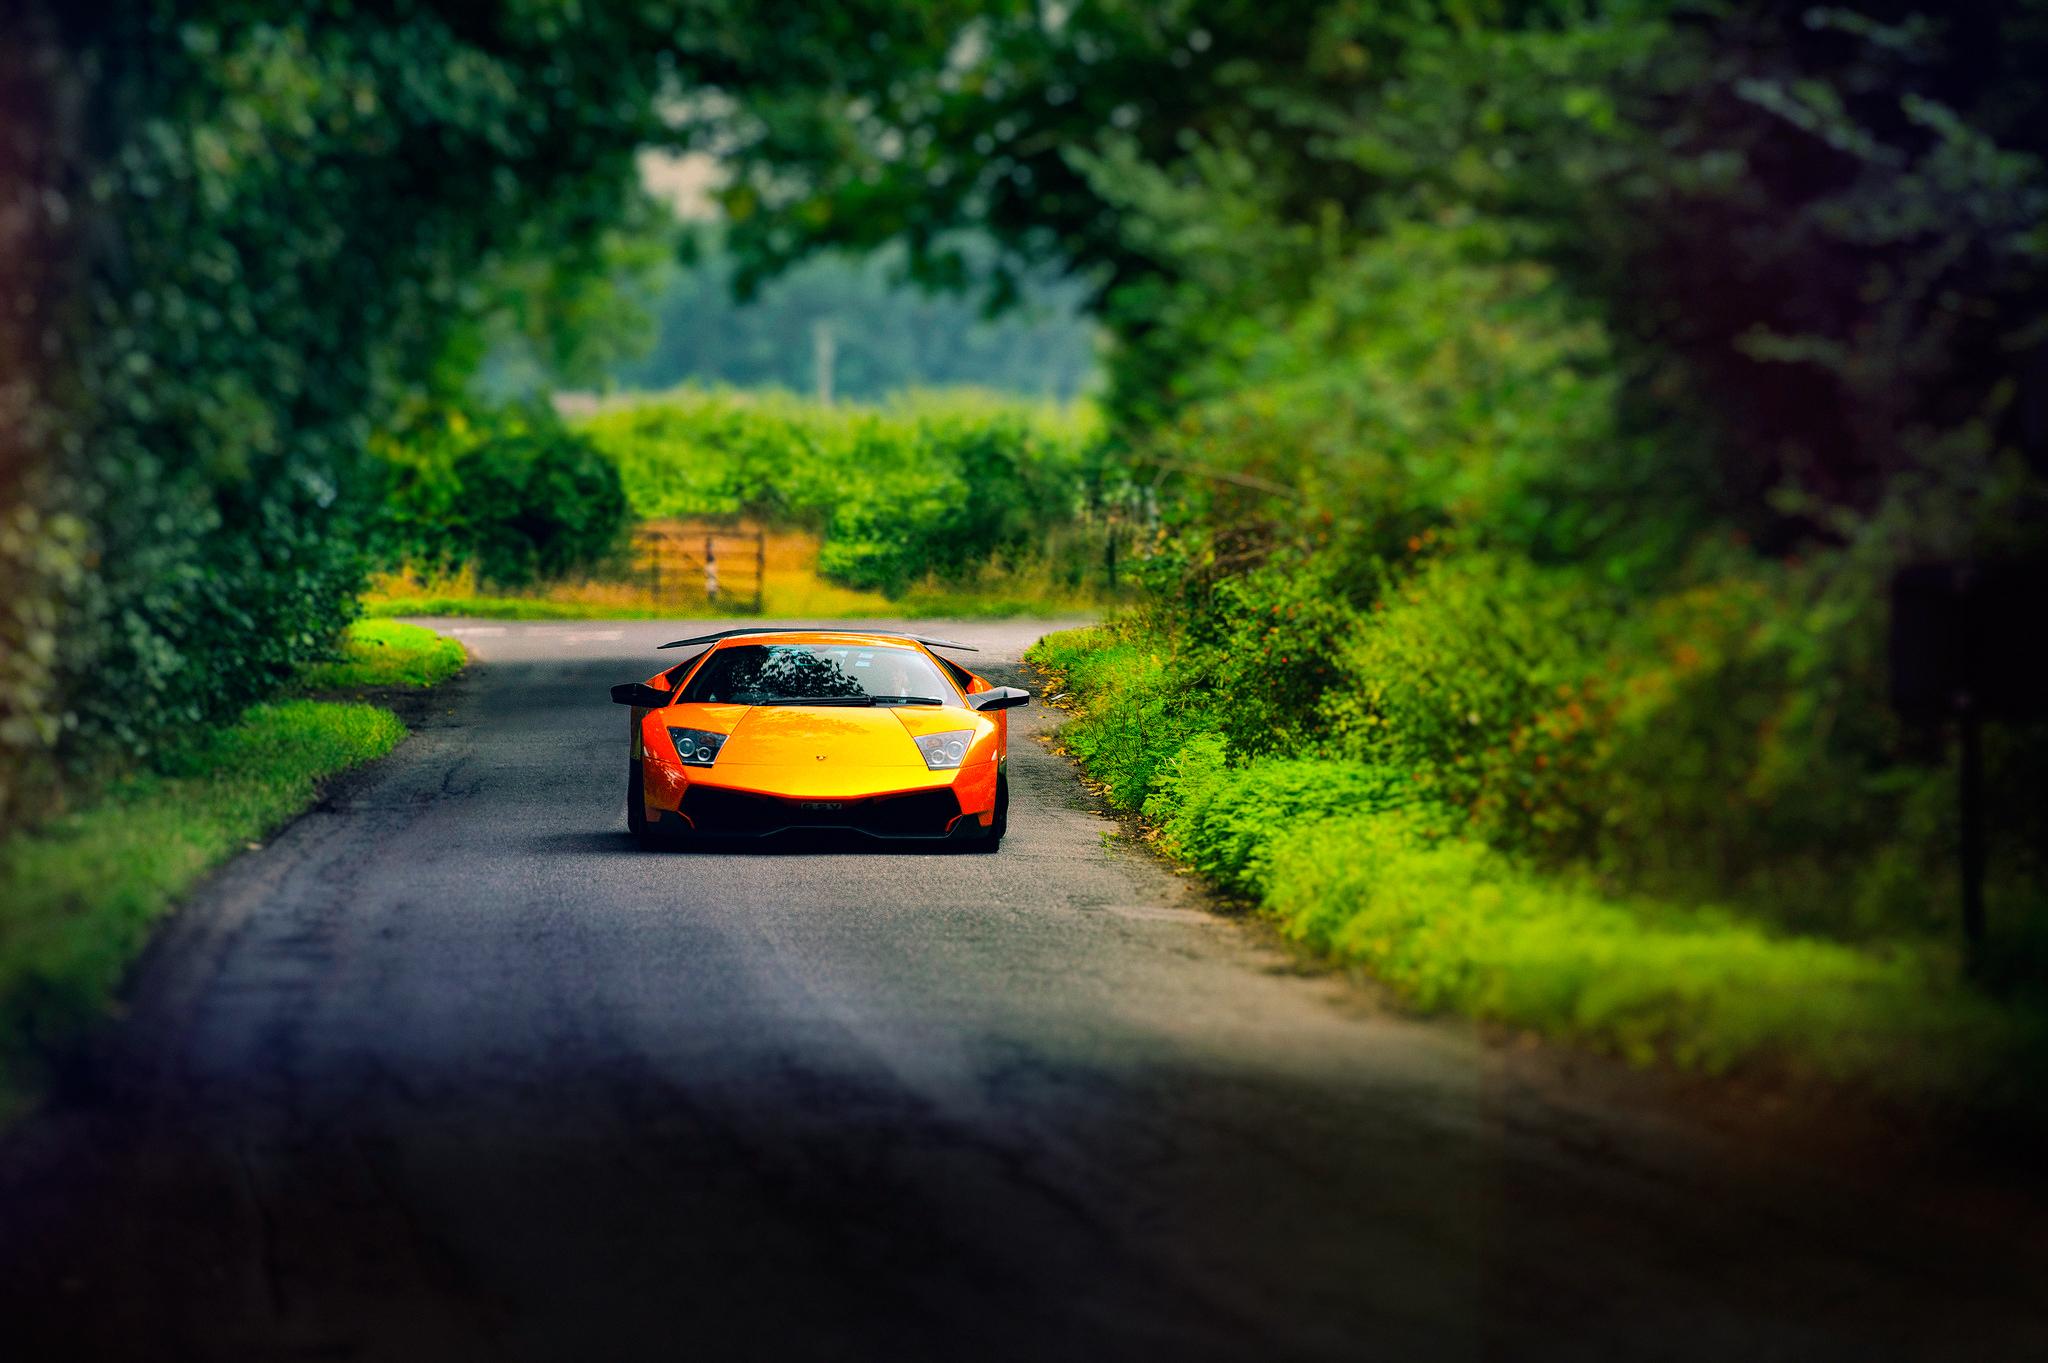 Картинка: Lamborghini, Murcielago, оранжевый, дорога, деревья